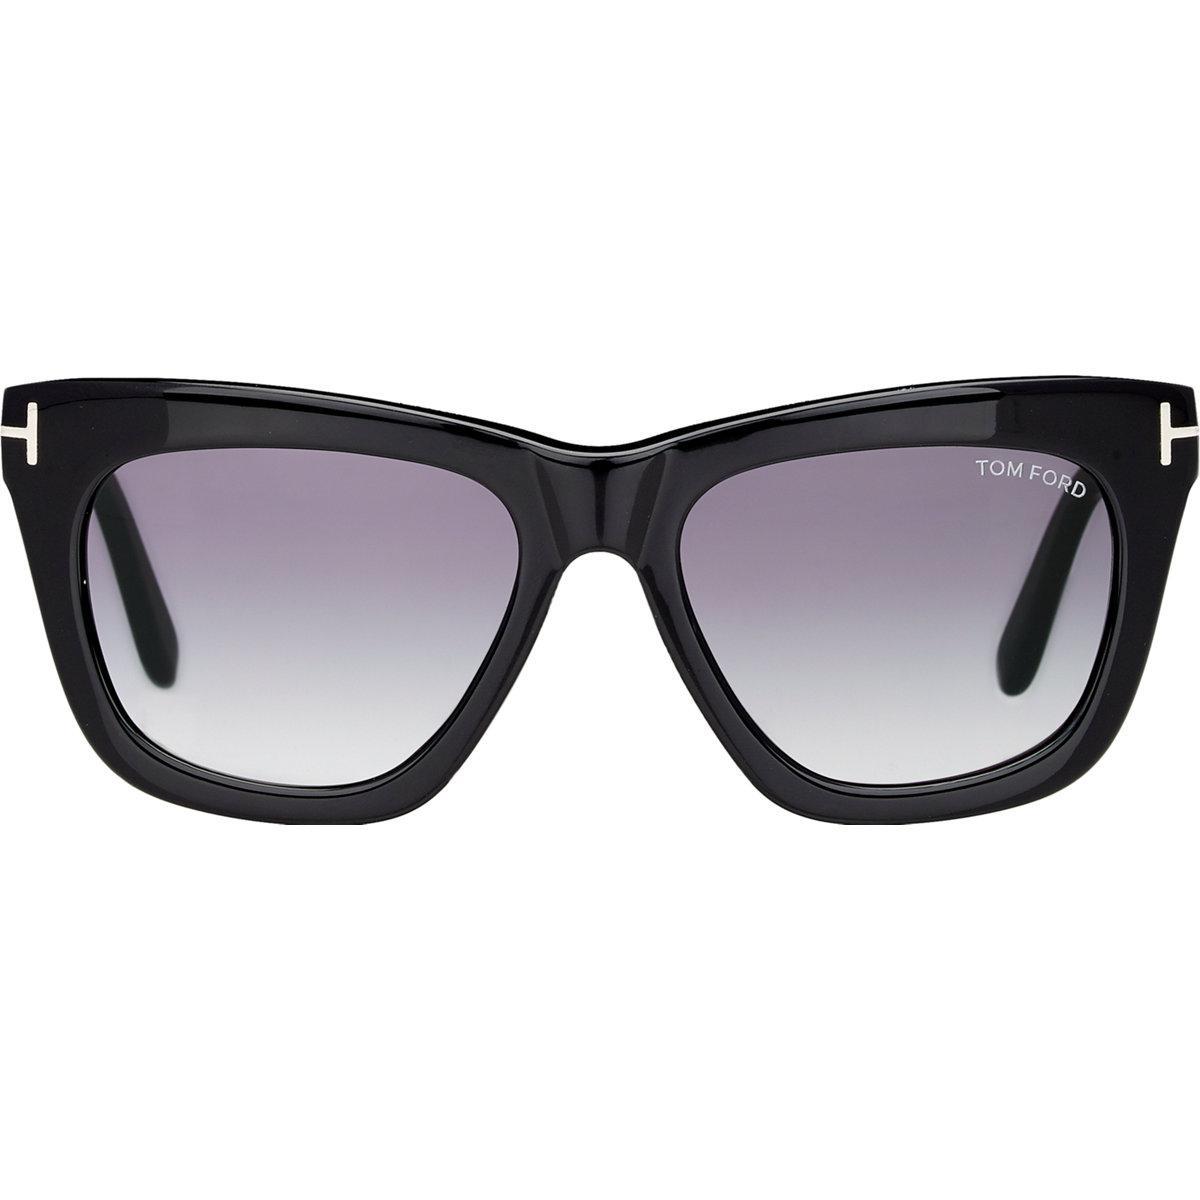 Tom Ford Celina - Black Sonnenbrille Black-blue-purple stripe 01A 55mm SA2Geku5